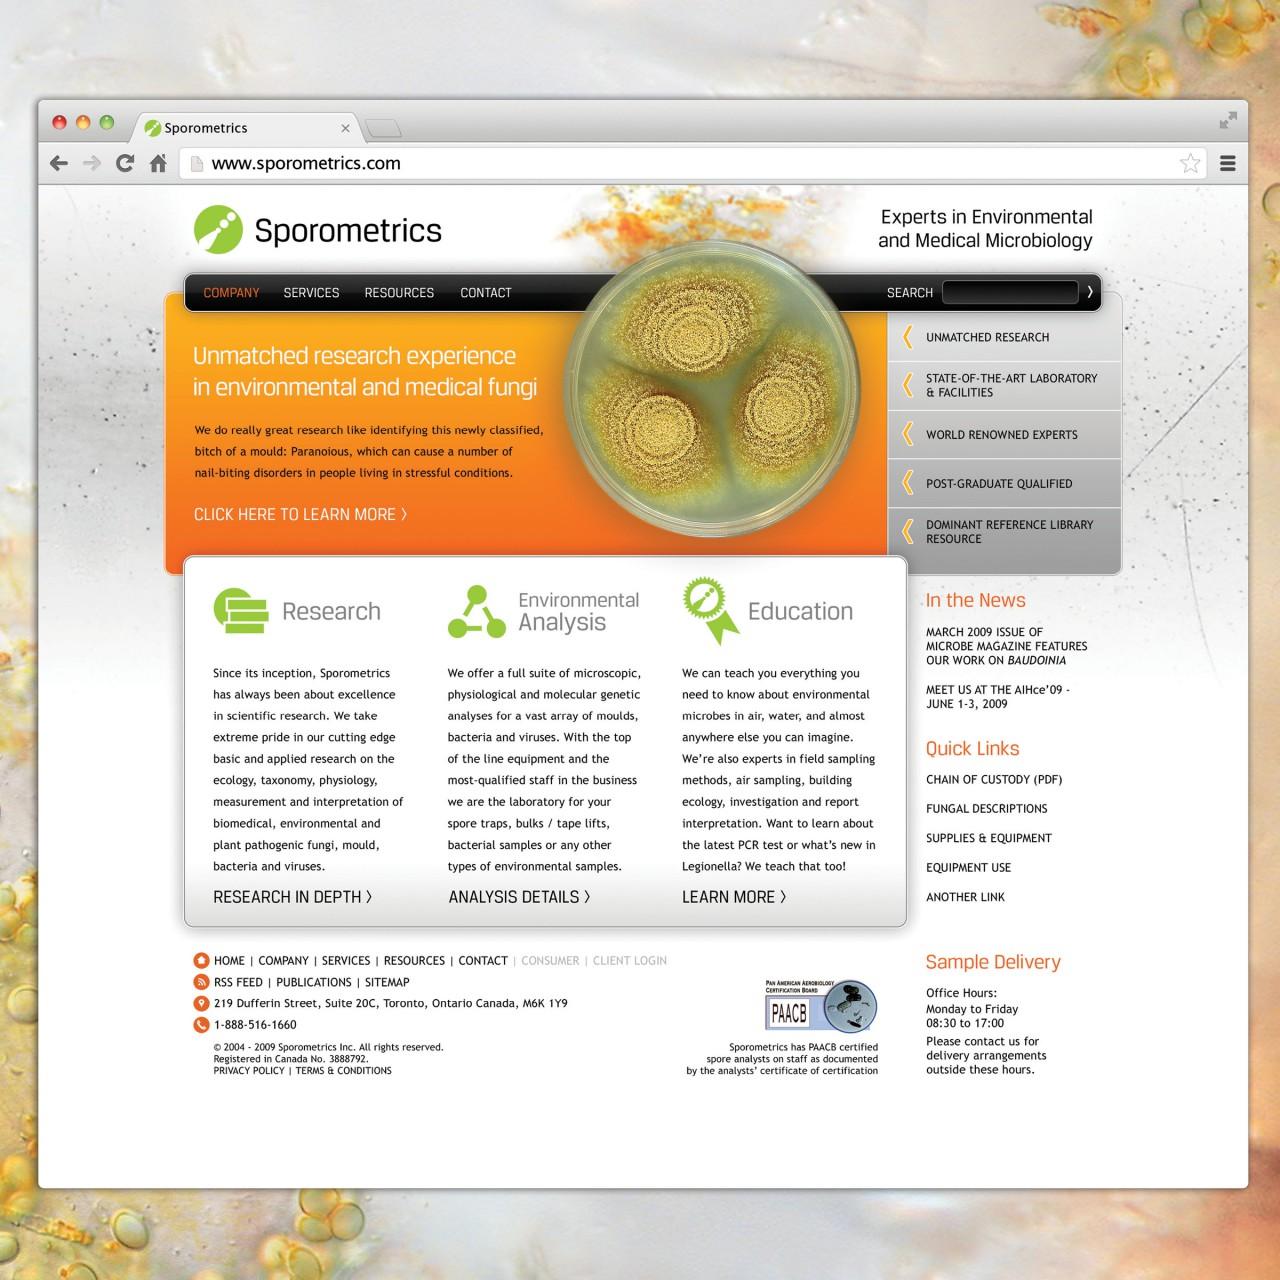 Image of Sporometrics logo website application